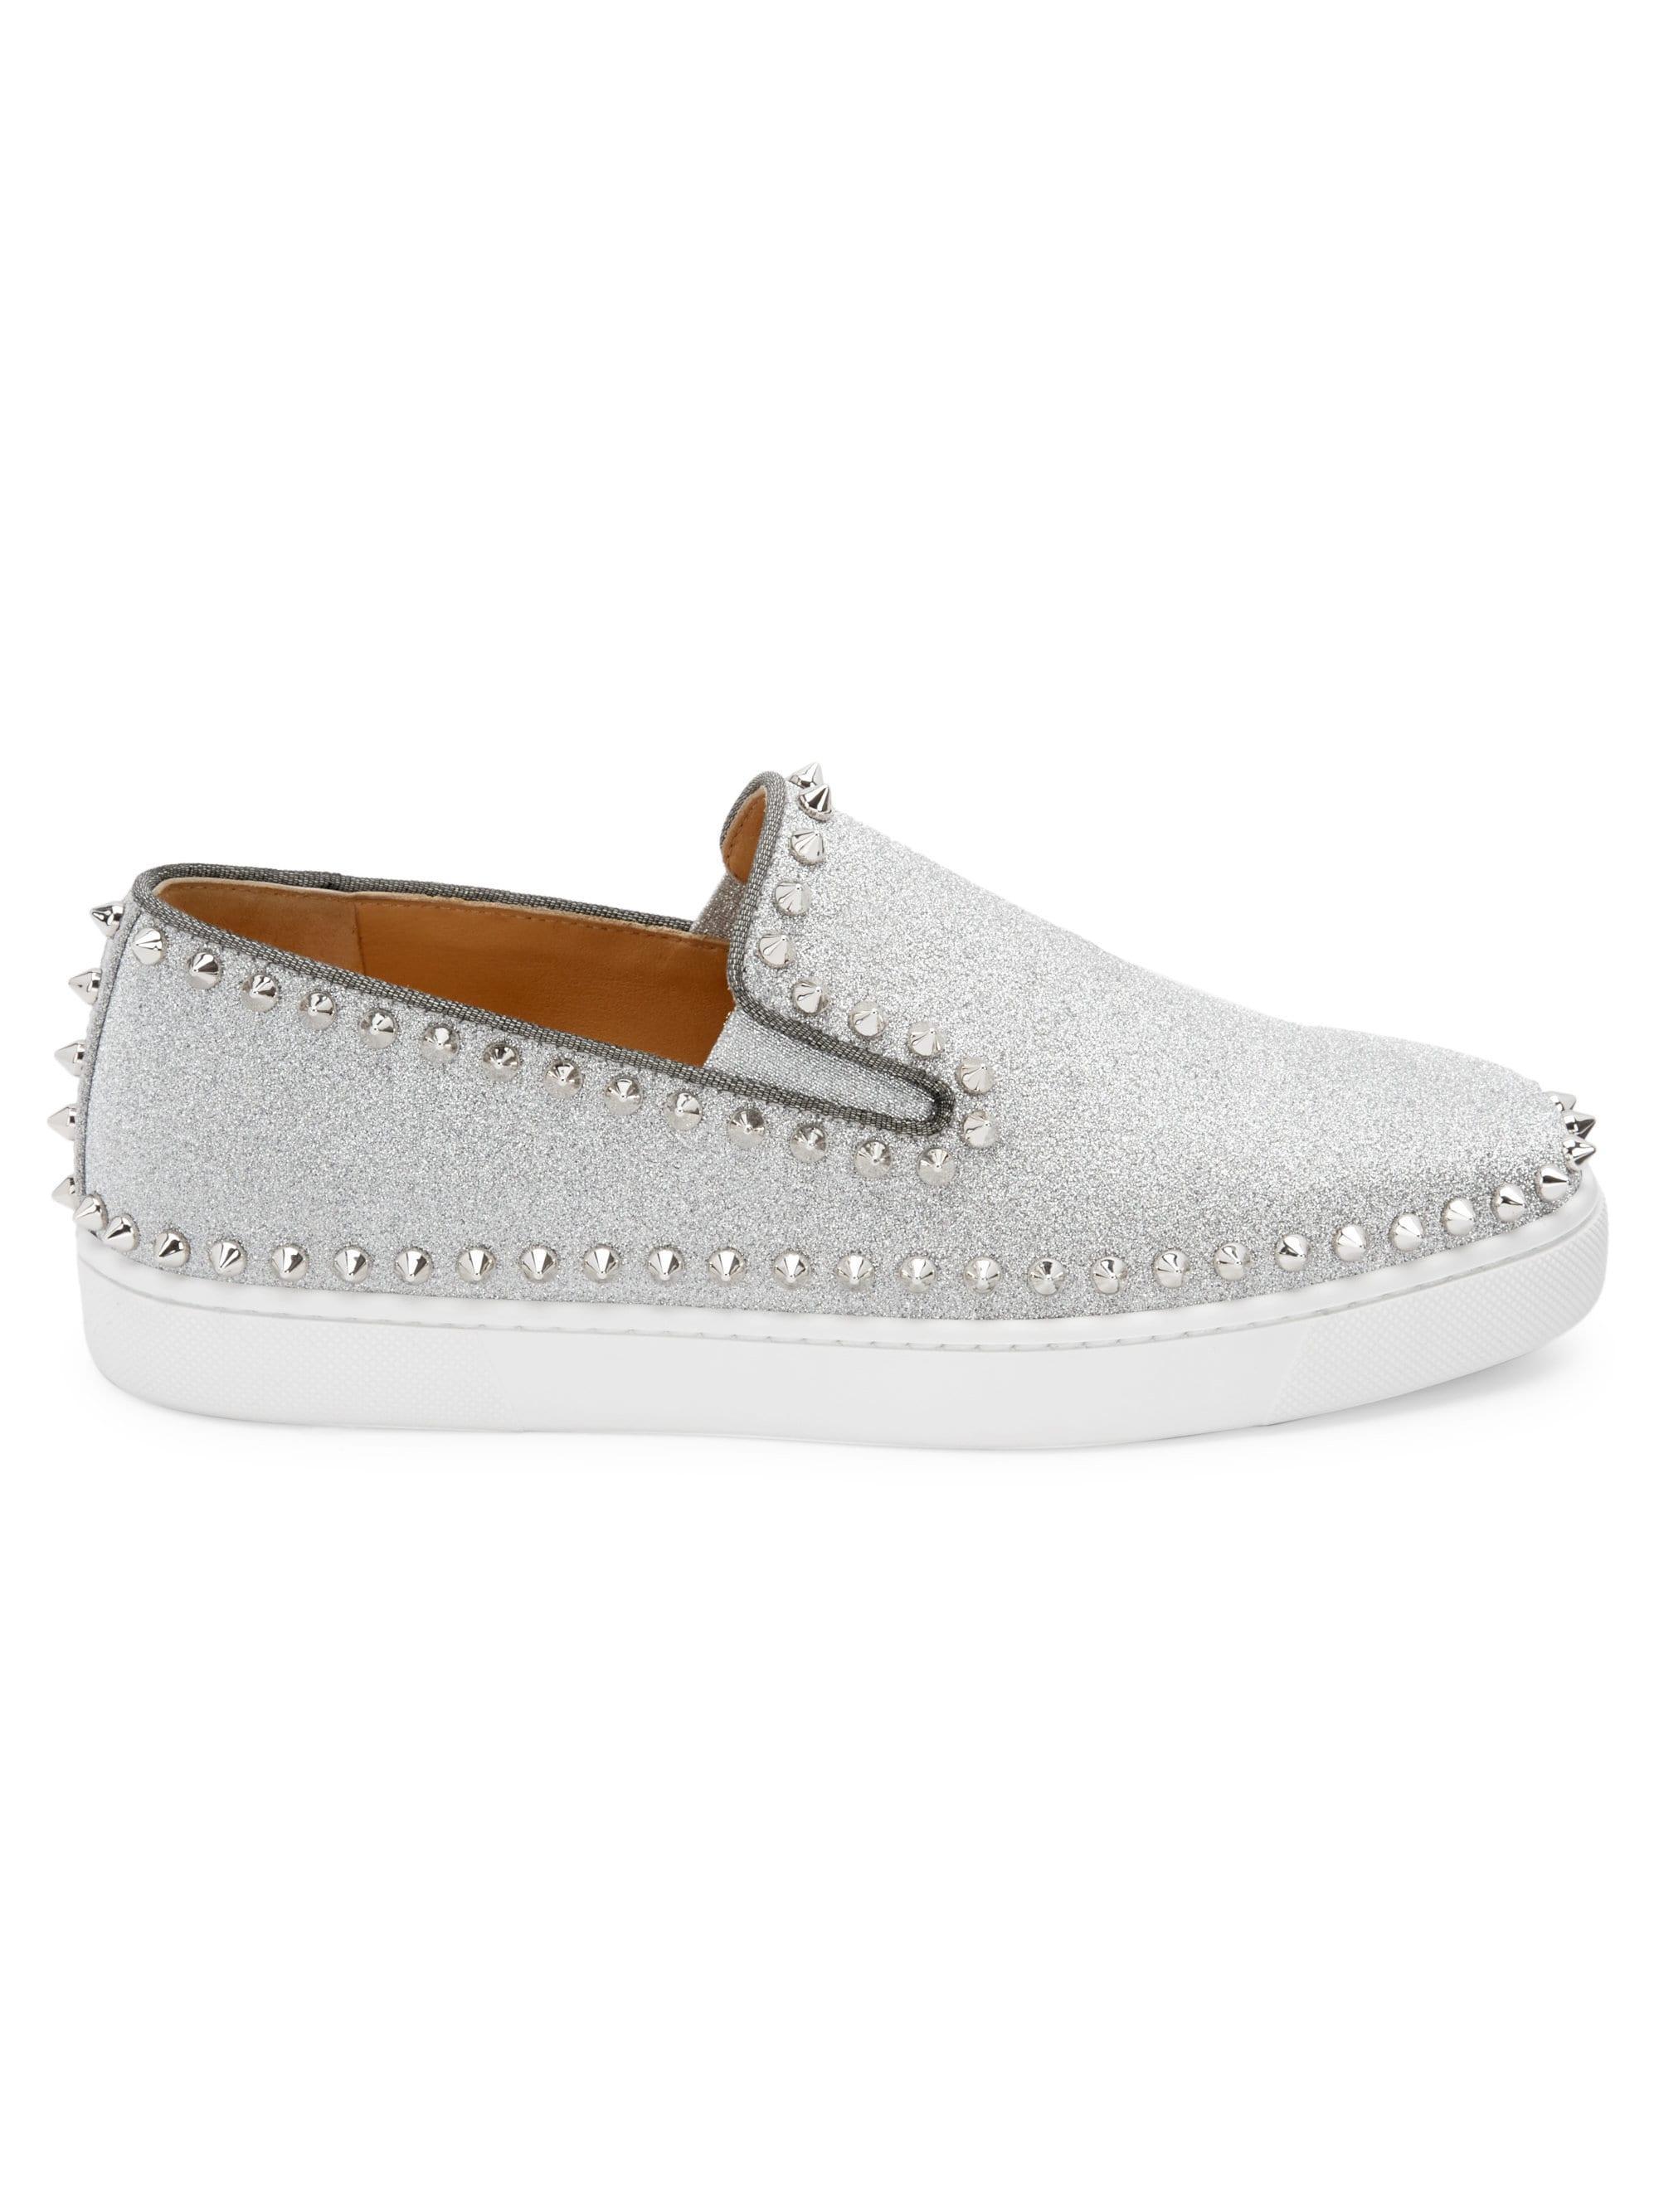 e5290d0541ce Christian Louboutin. Women s Metallic Pik Glitter Boat Shoes.  995 From Saks  Fifth Avenue